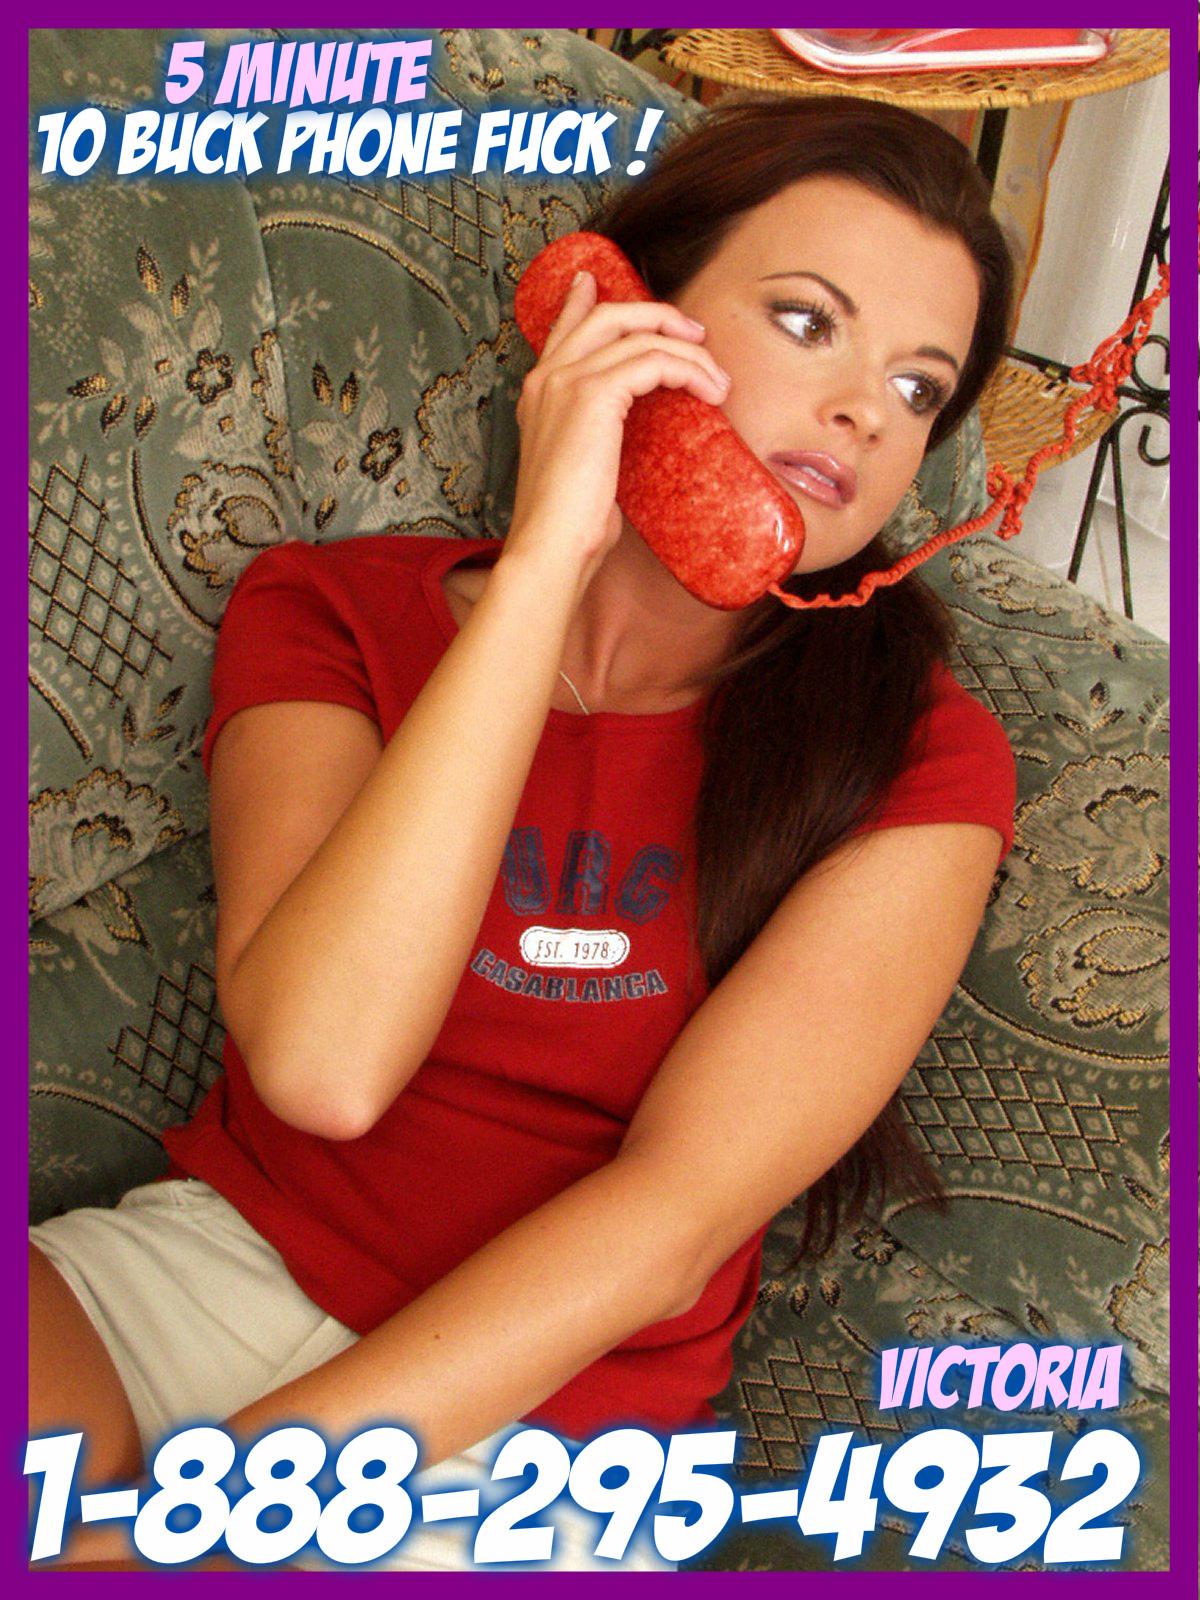 5 min quickie phone sex